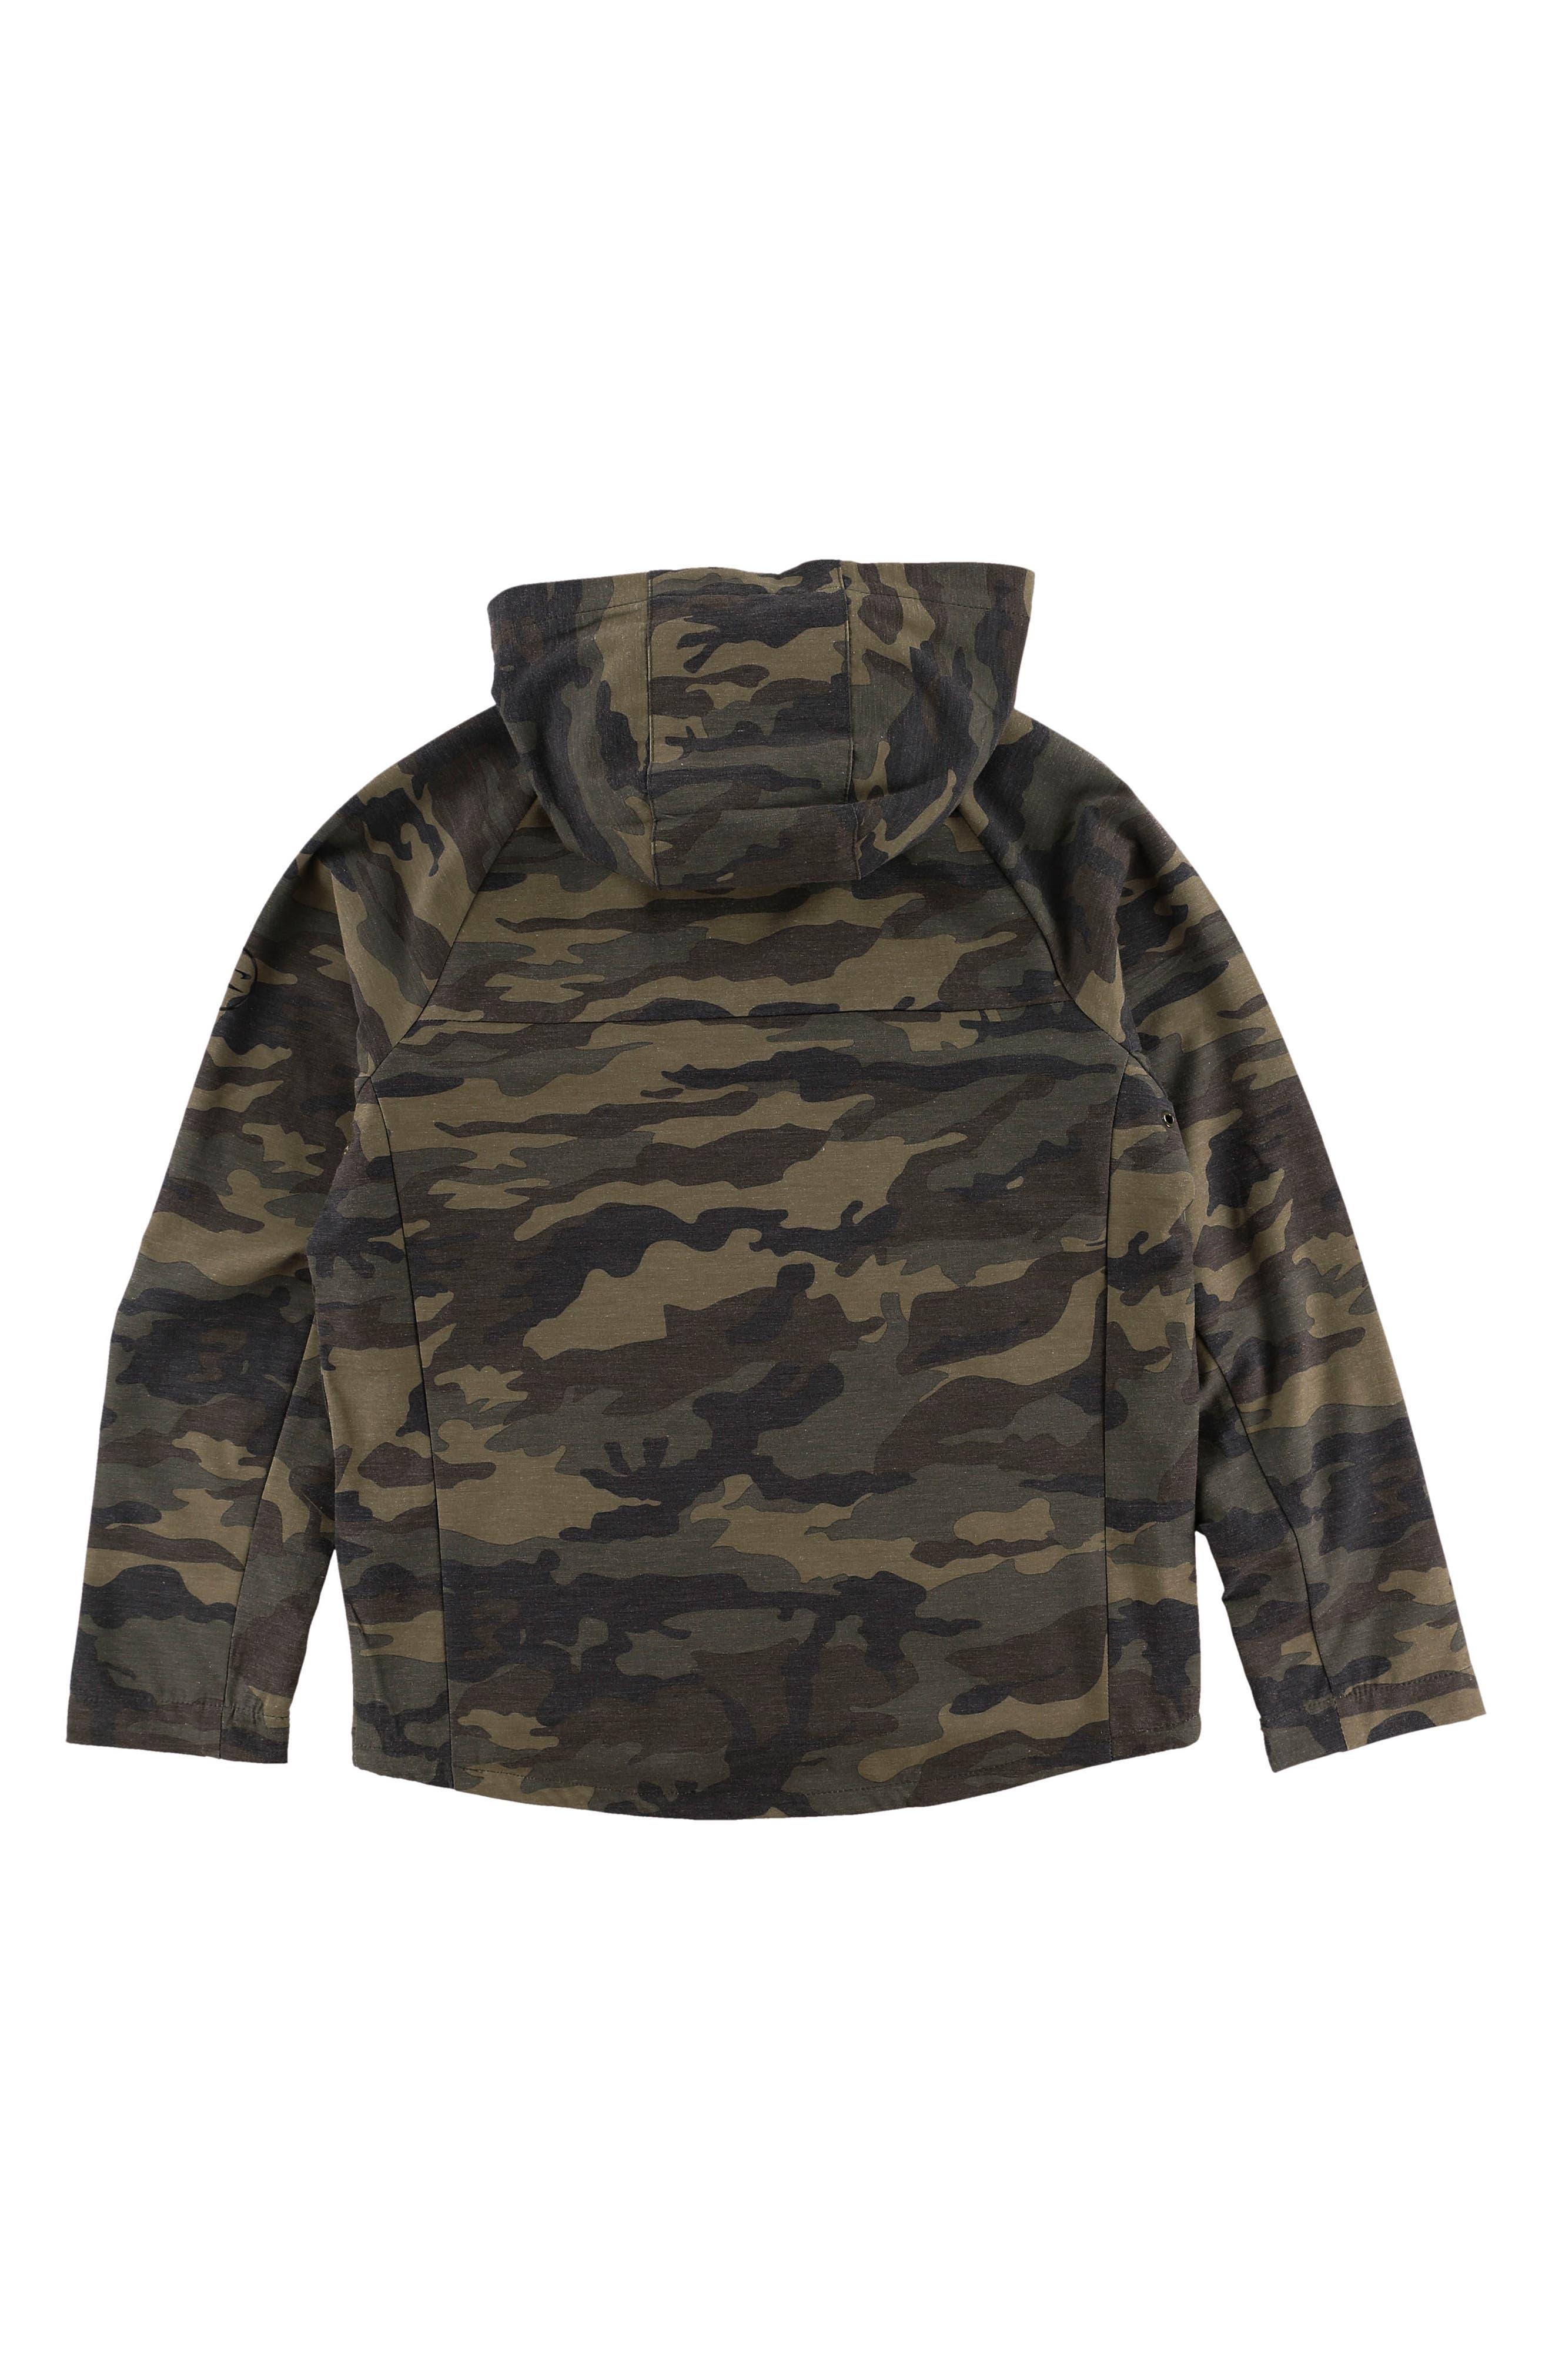 Traveler Dawn Patrol Camo Hooded Windbreaker Jacket,                             Alternate thumbnail 2, color,                             310